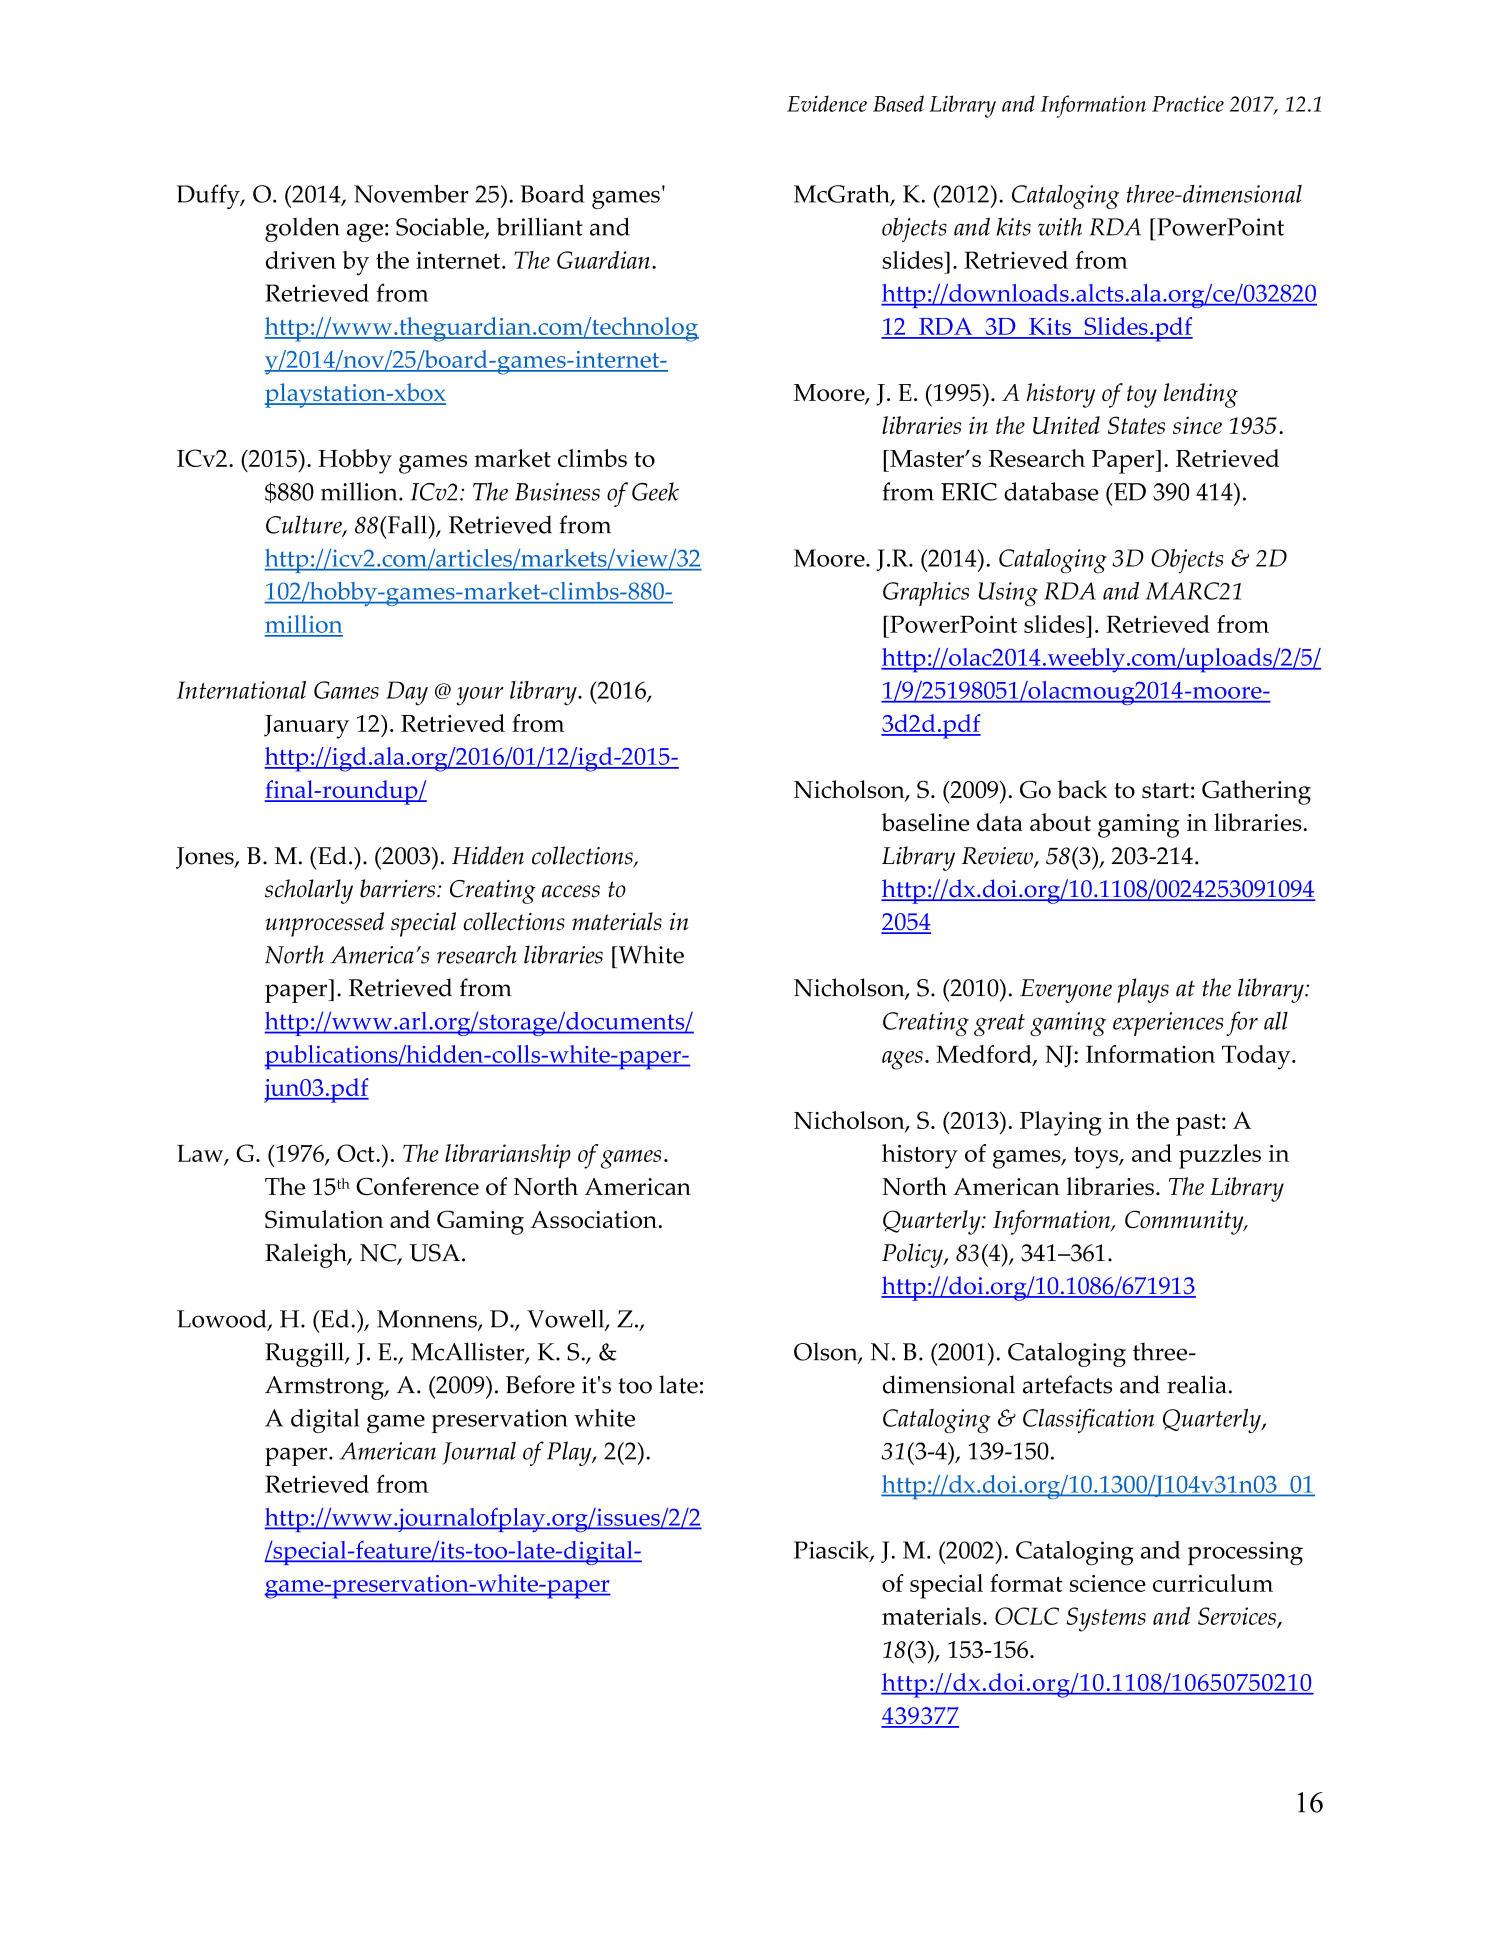 essay about press freedom pdf